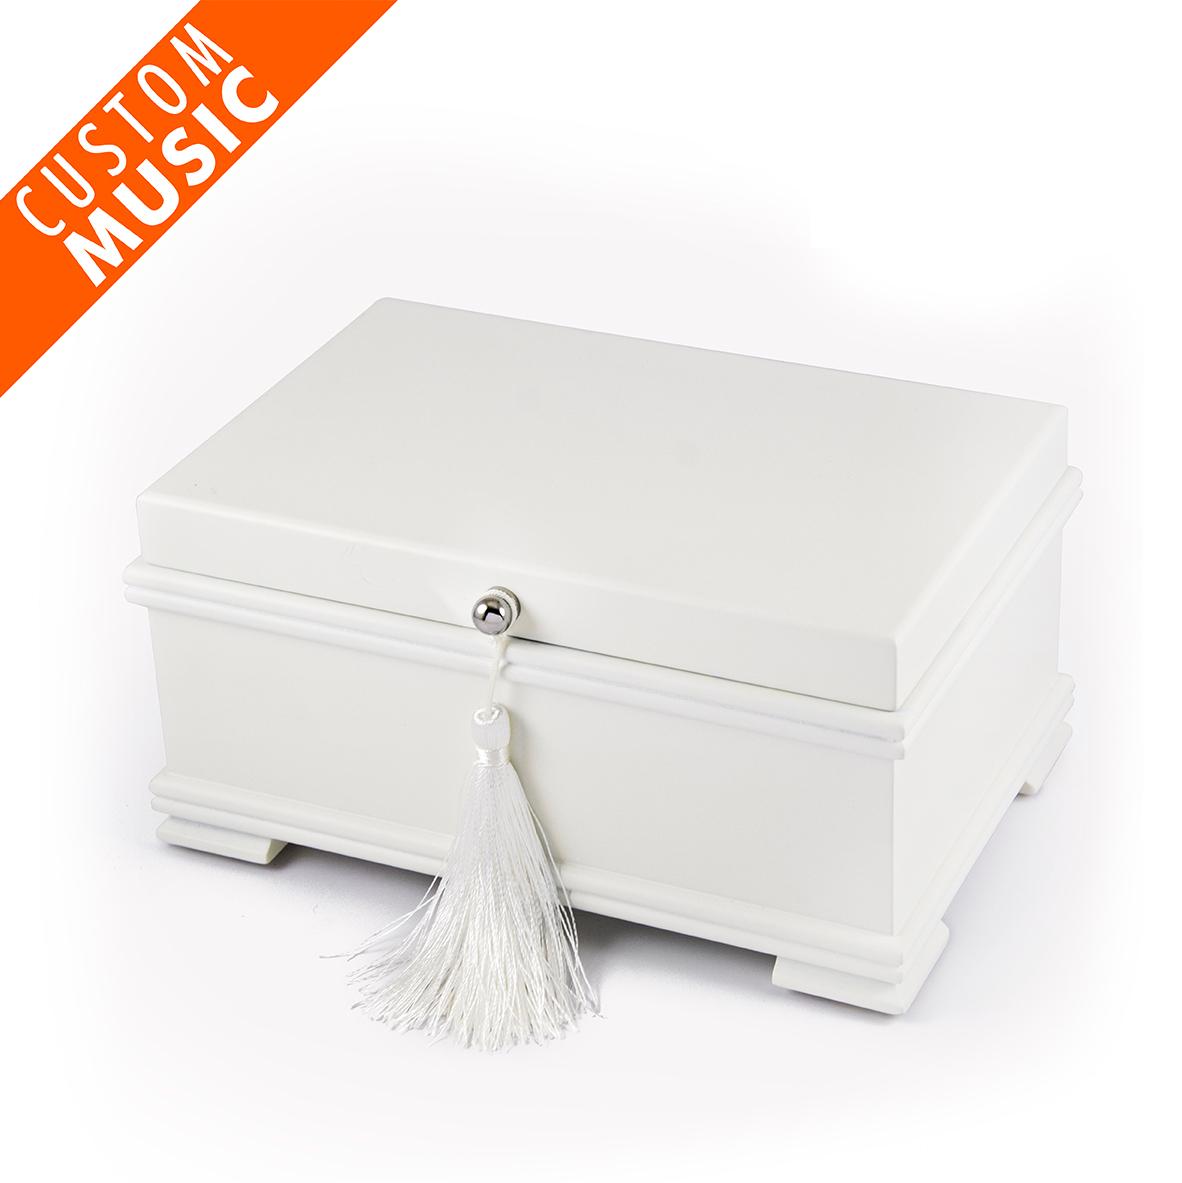 Matte White Custom USB Sound Module Jewelry Box With Lift-Up Tray